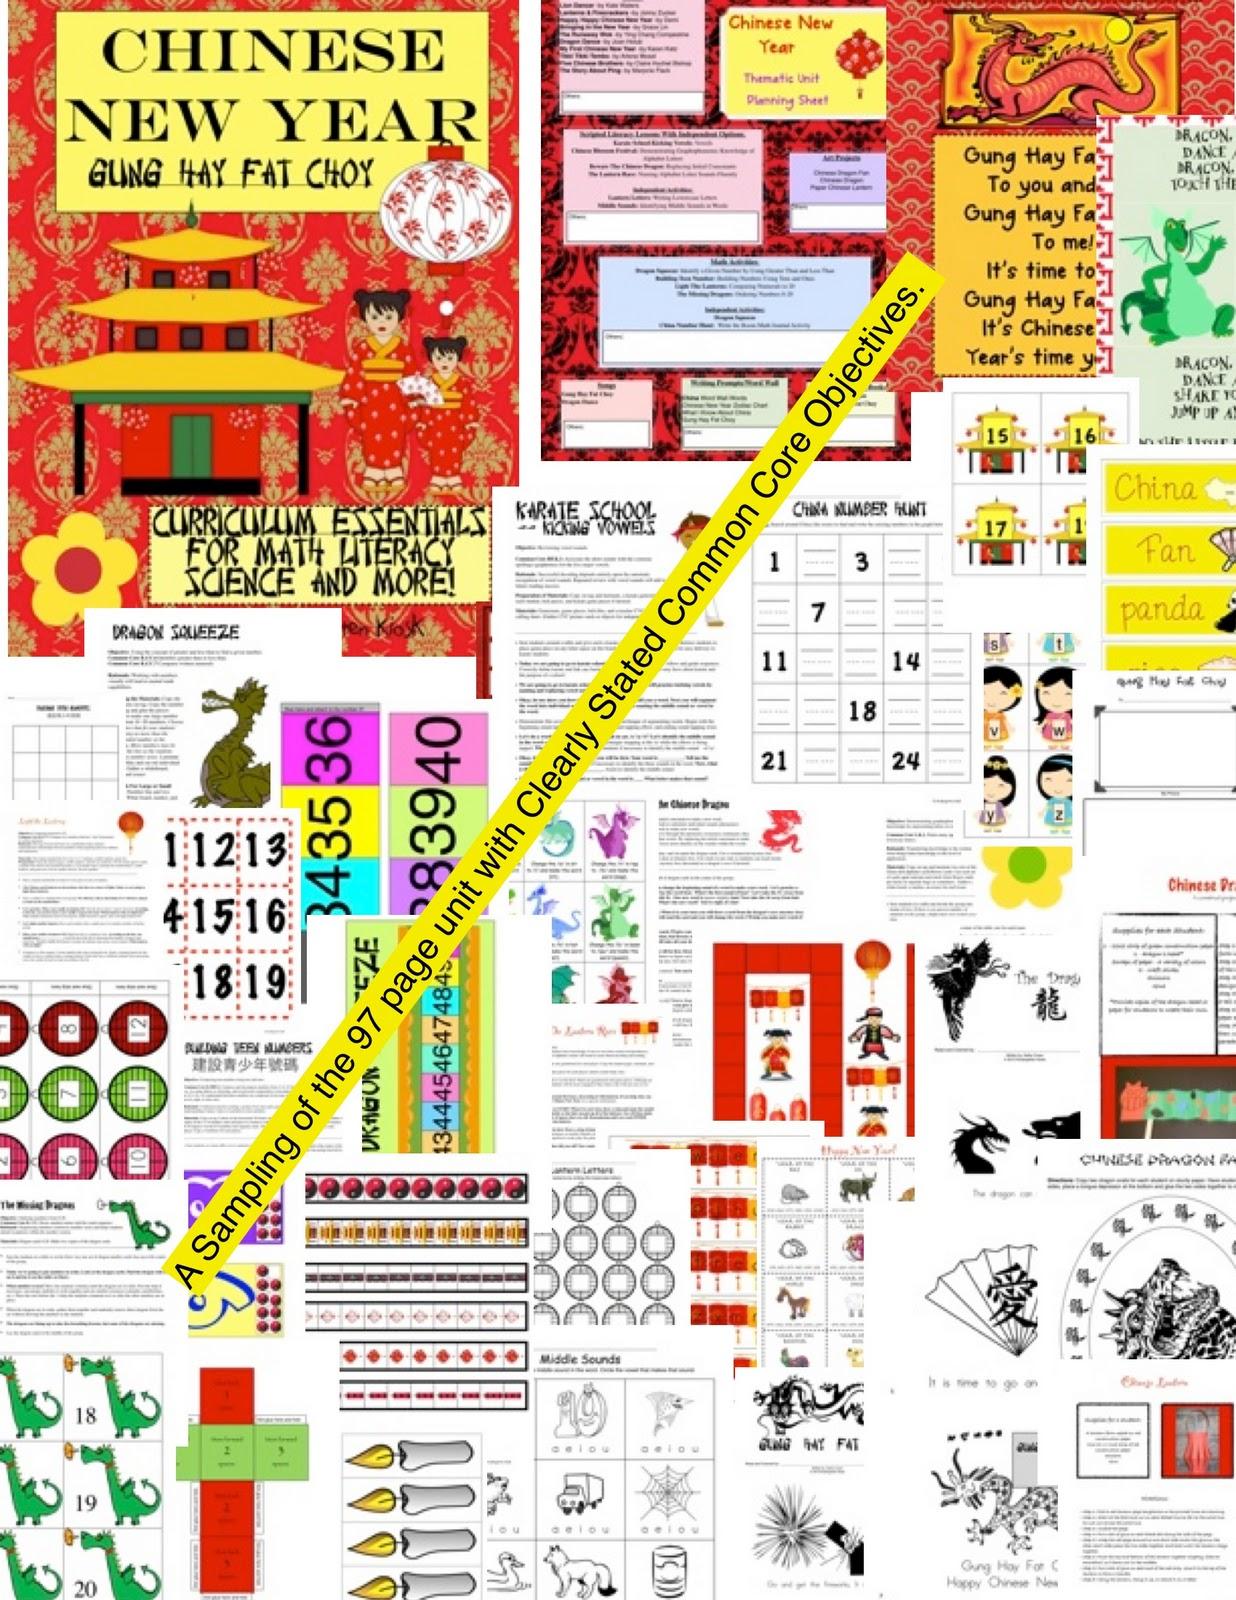 Kindergarten Kiosk Chinese New Year Gung Hay Fat Choy